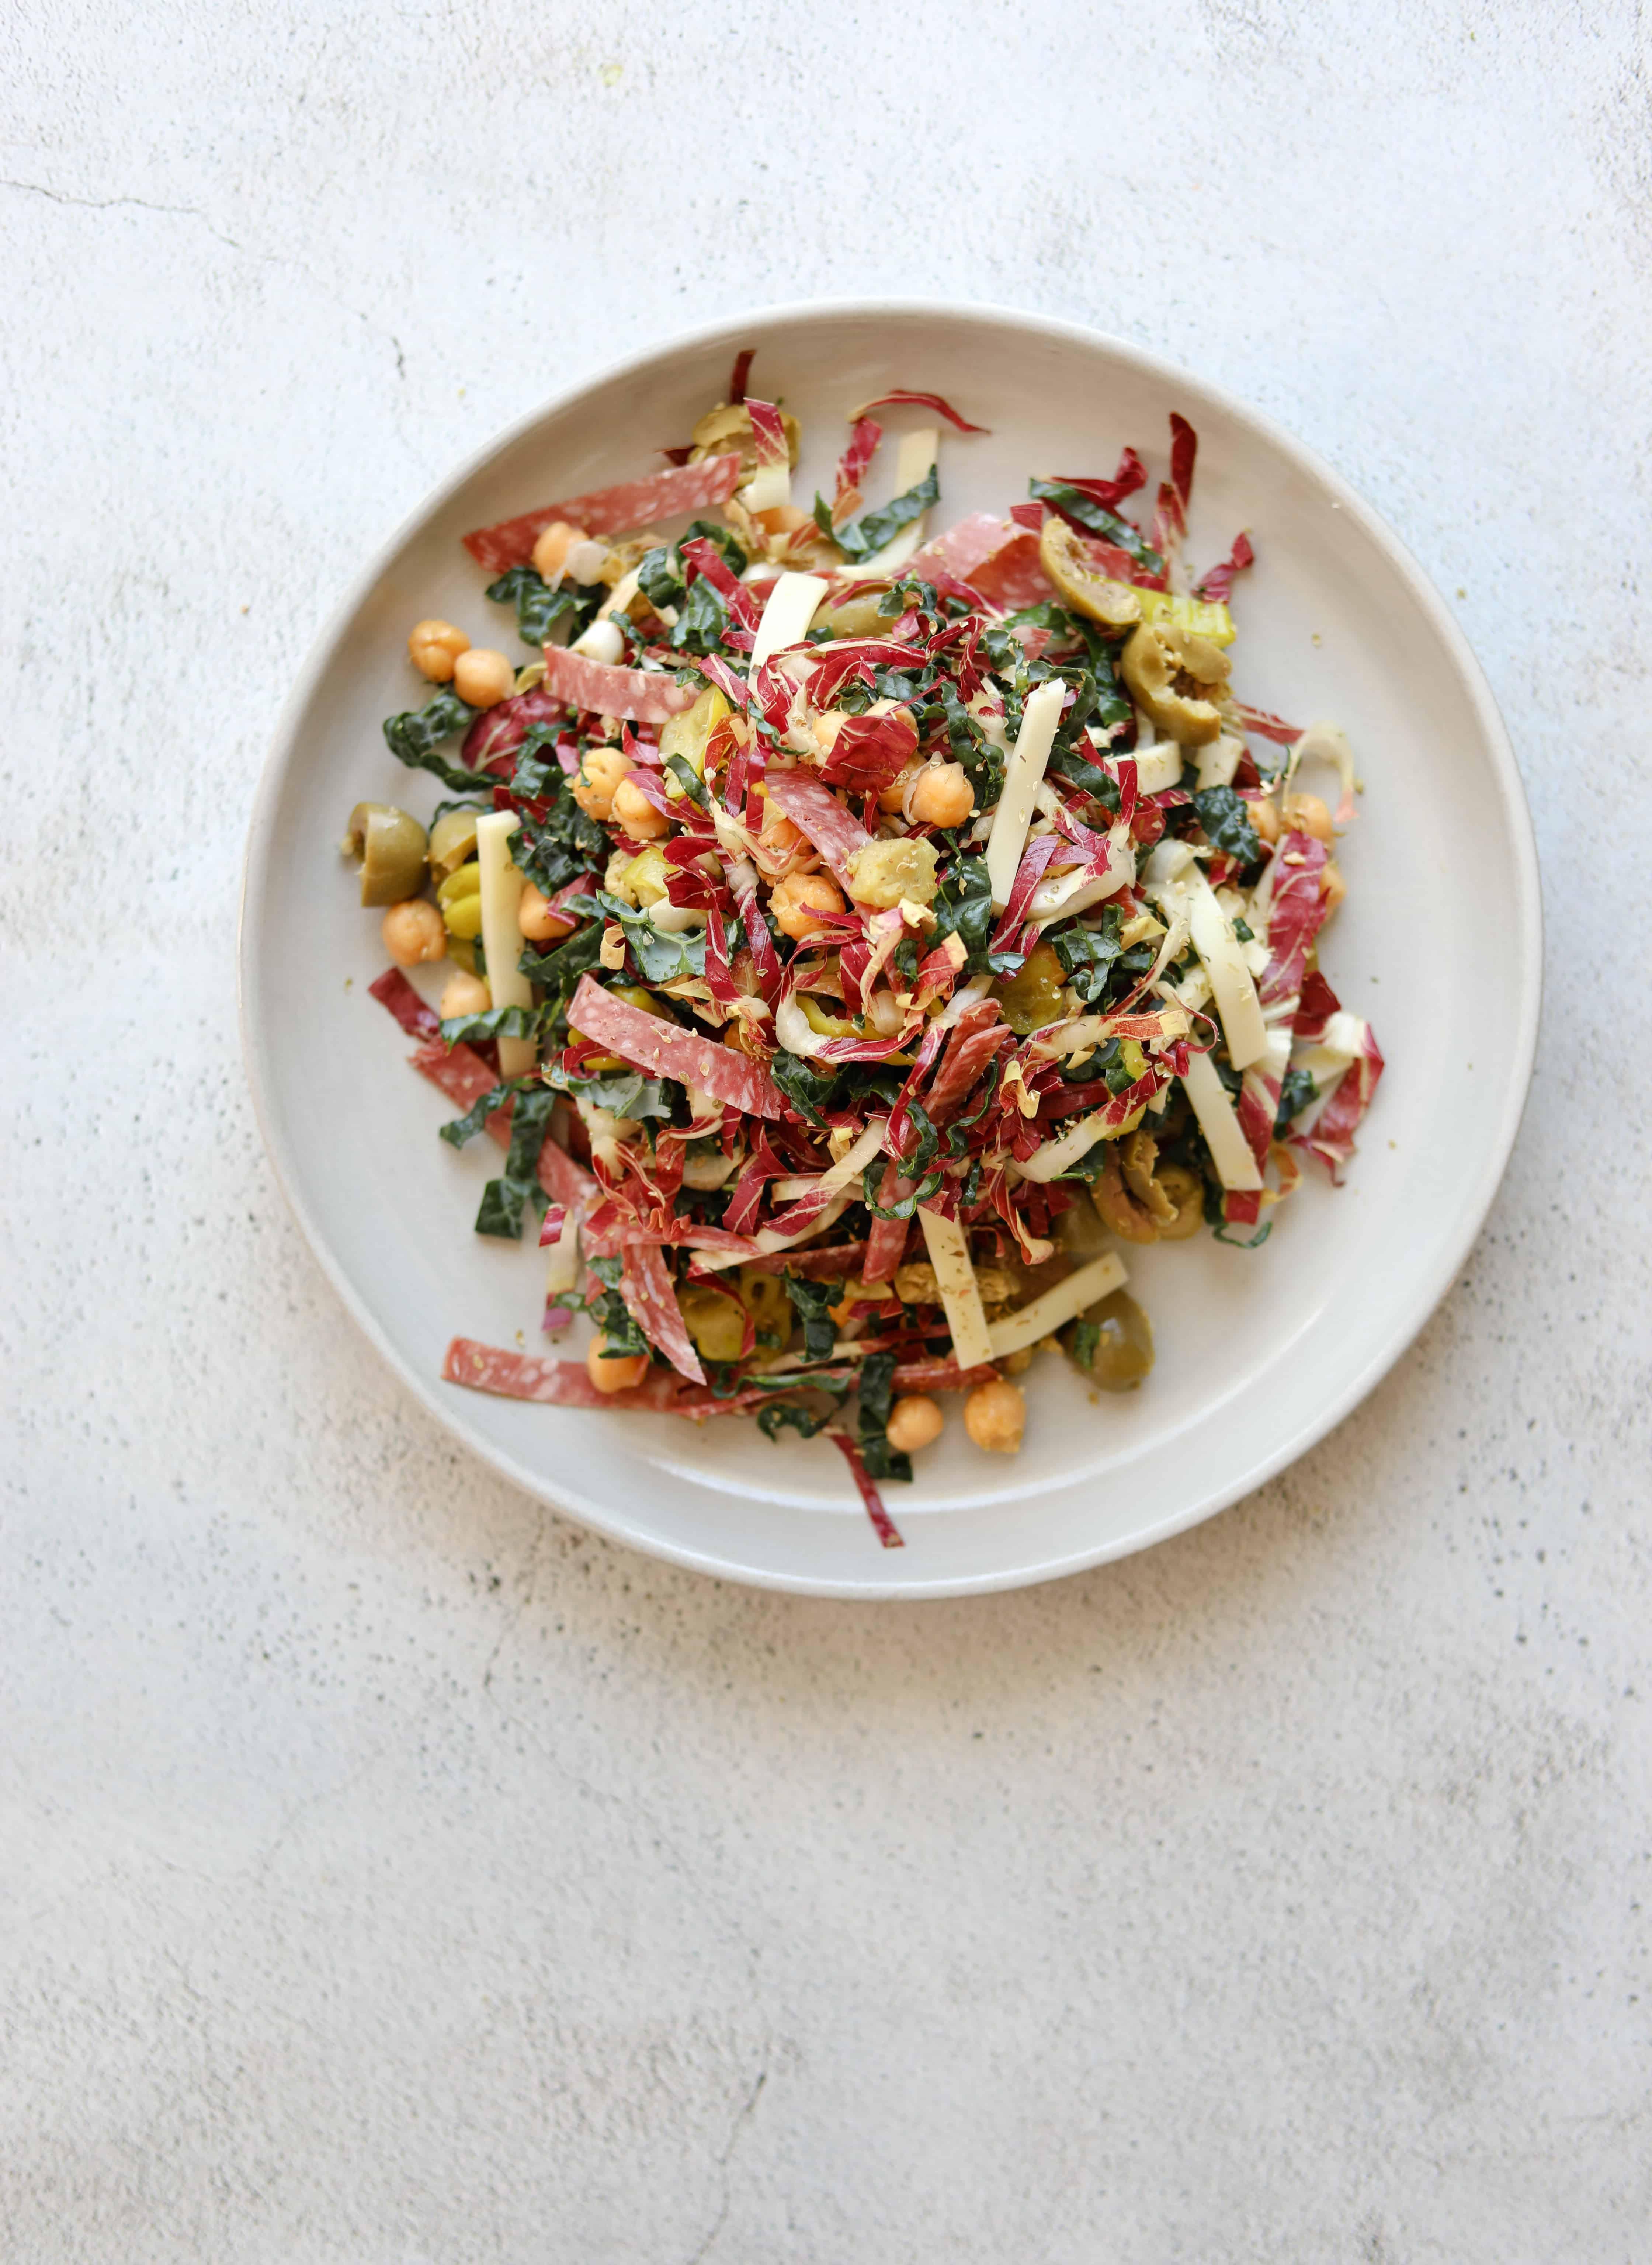 California Chopped Salad in a bowl